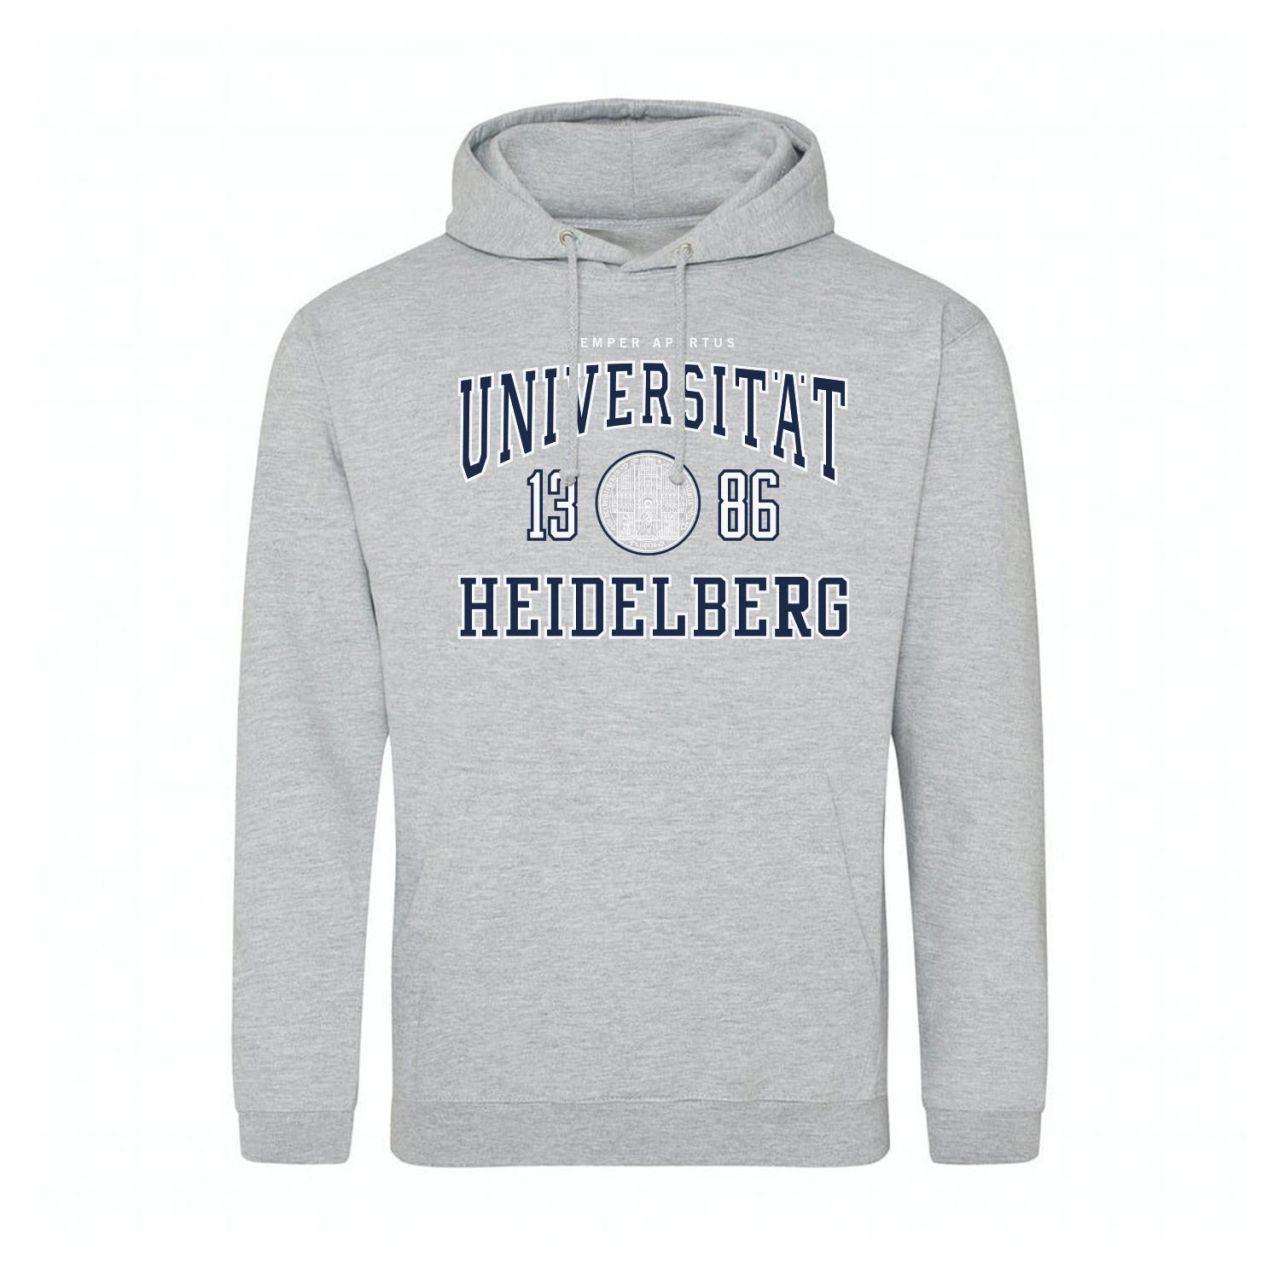 Classic Hooded Sweatshirt, heather grey, classic